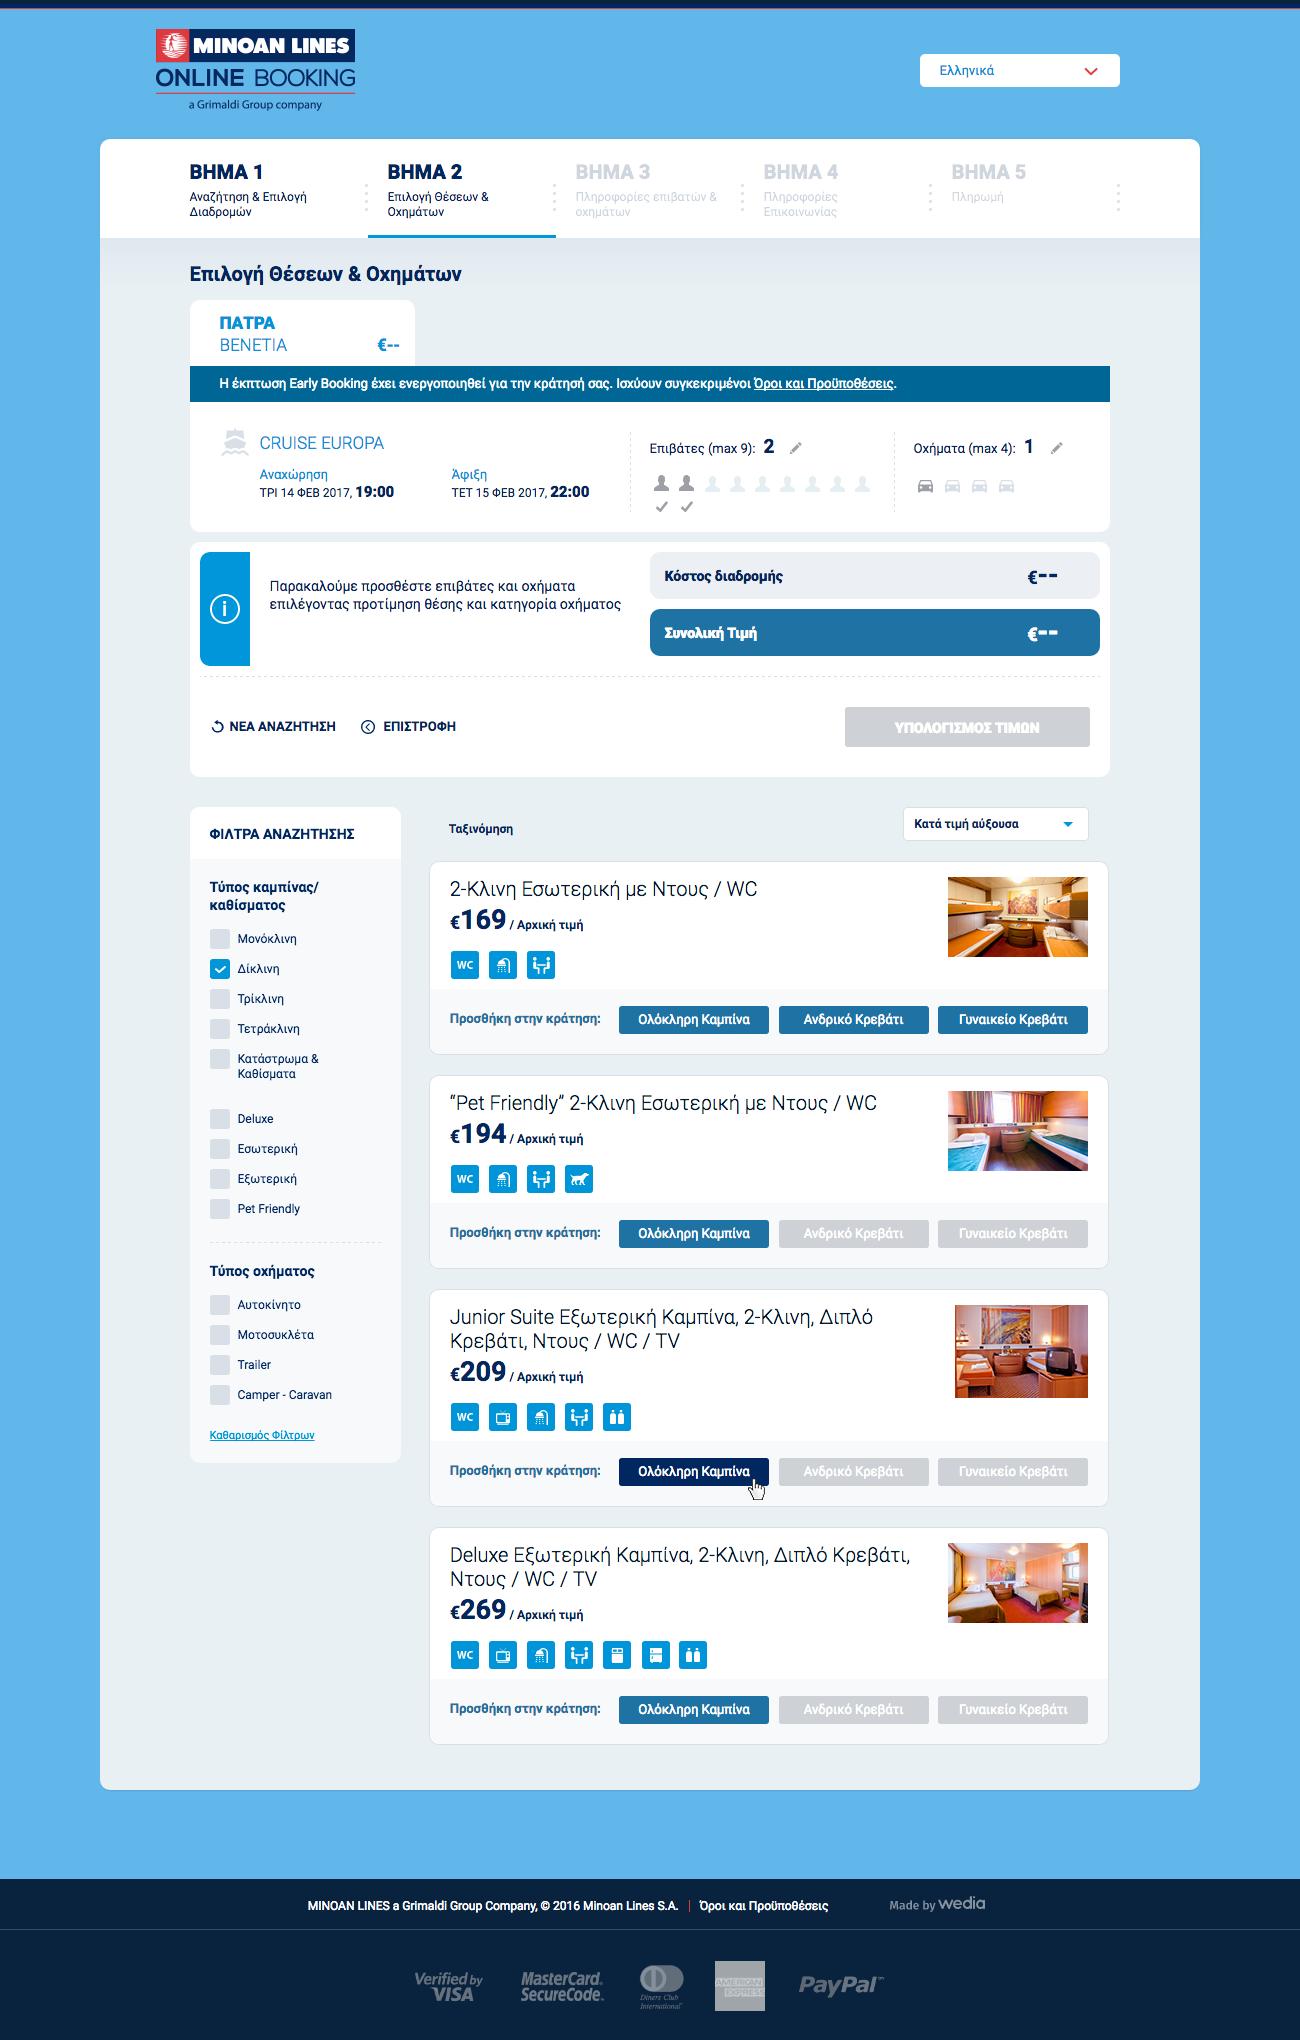 Online booking ακτοπλοϊκών εισιτηρίων - Minoan Lines